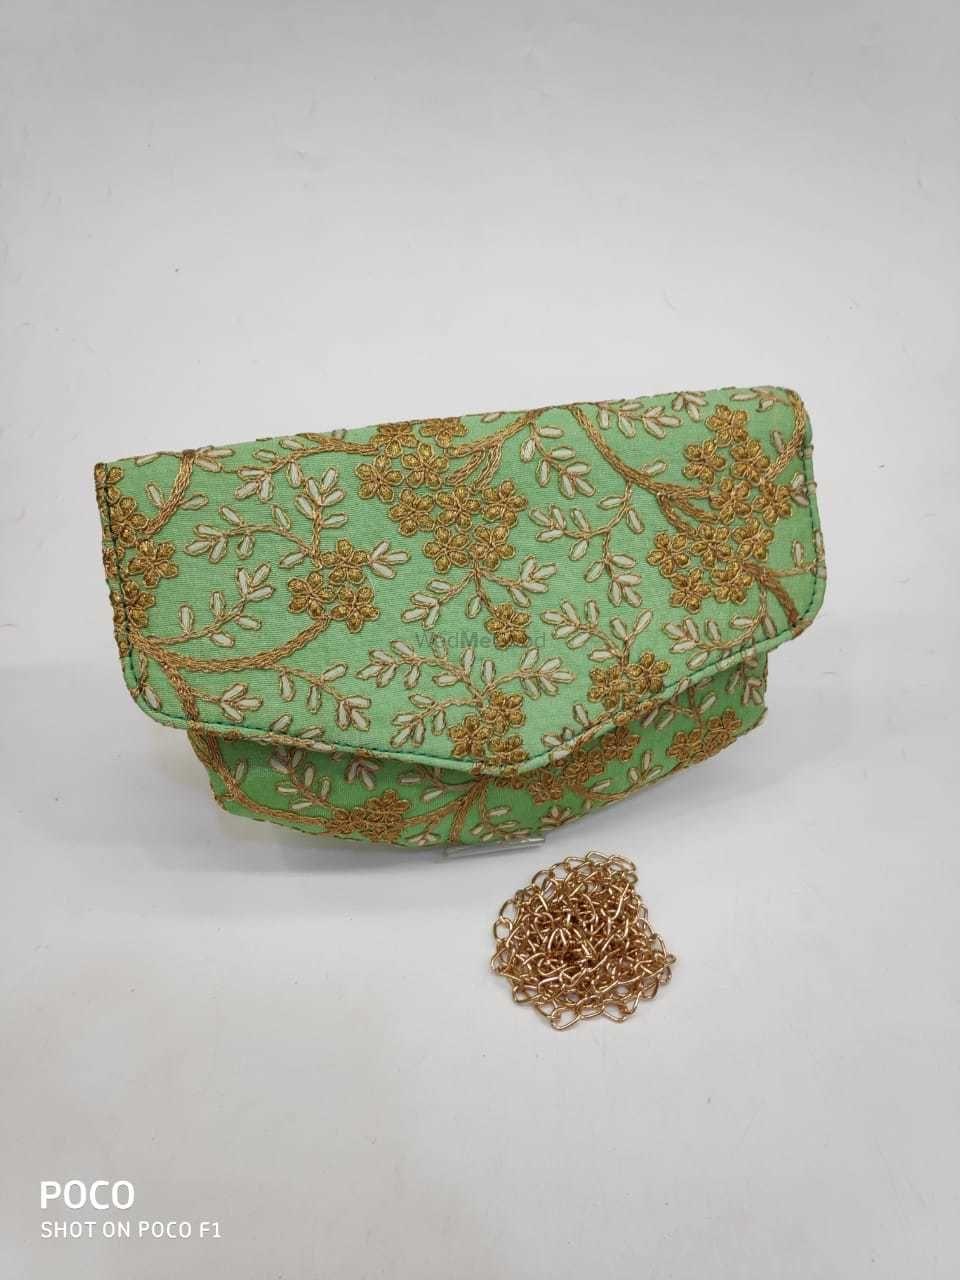 Photo From Giveaways - By Handicraft Halt